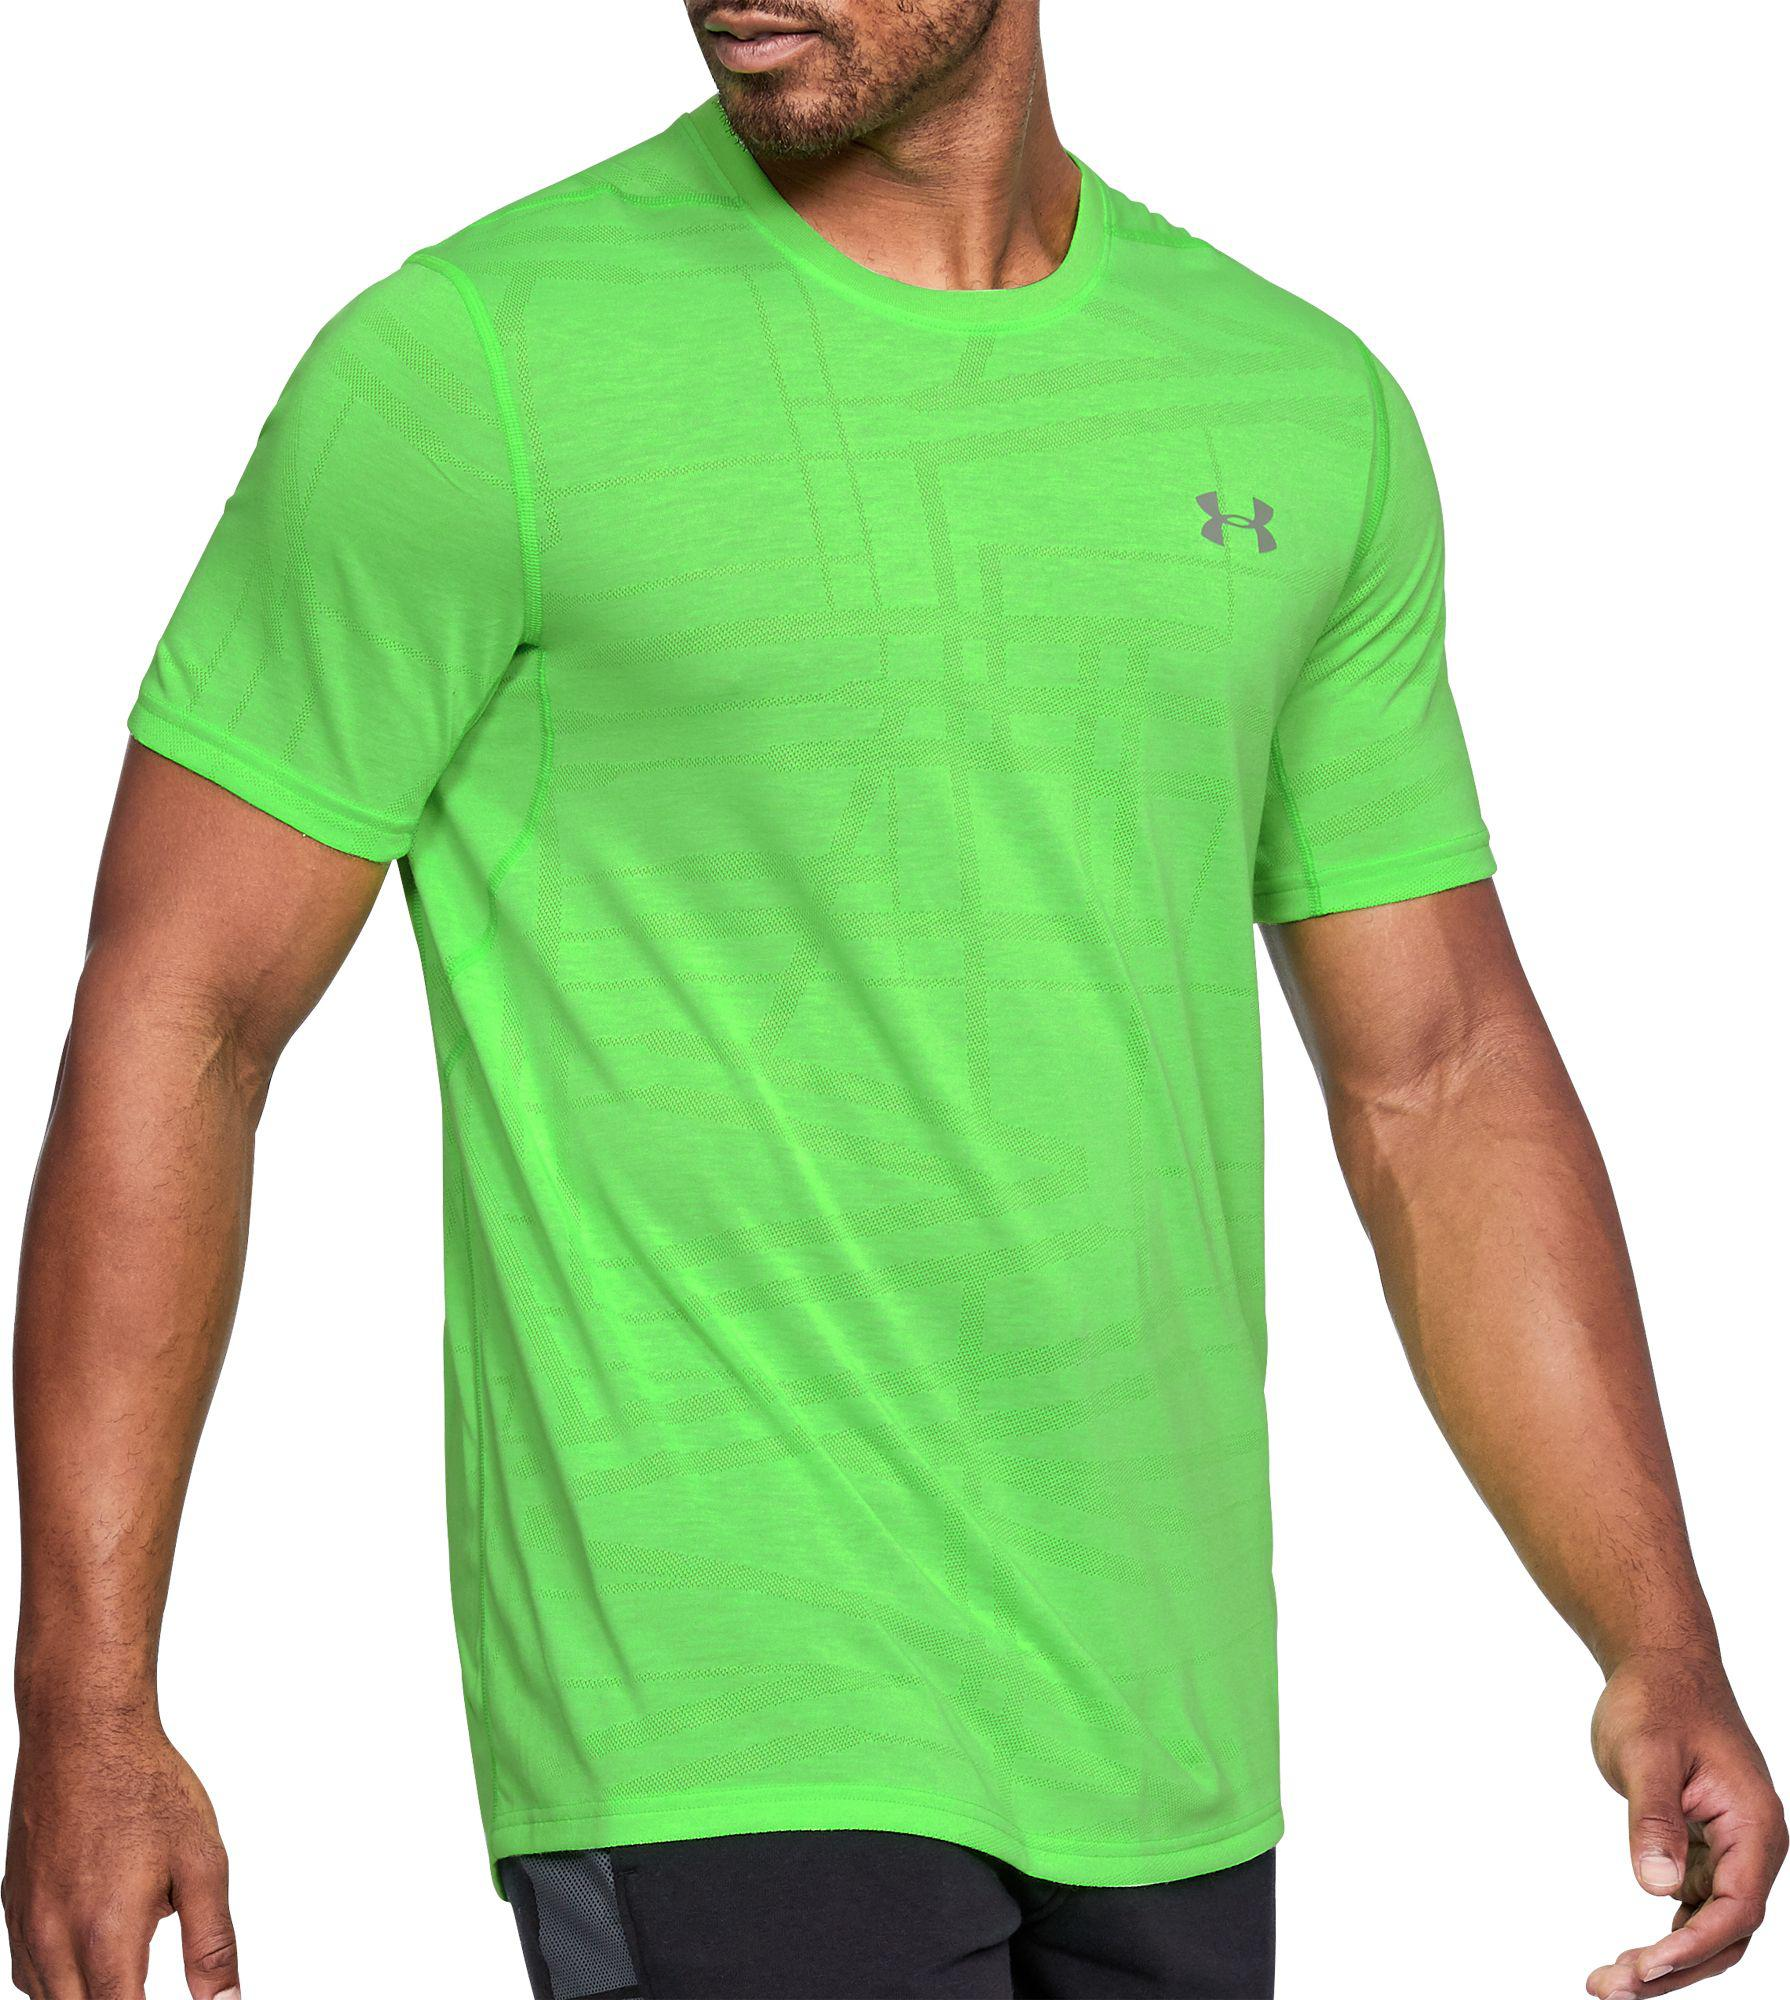 c4fa8dafc Under Armour Threadborne Siro Elite T-shirt in Green for Men - Lyst